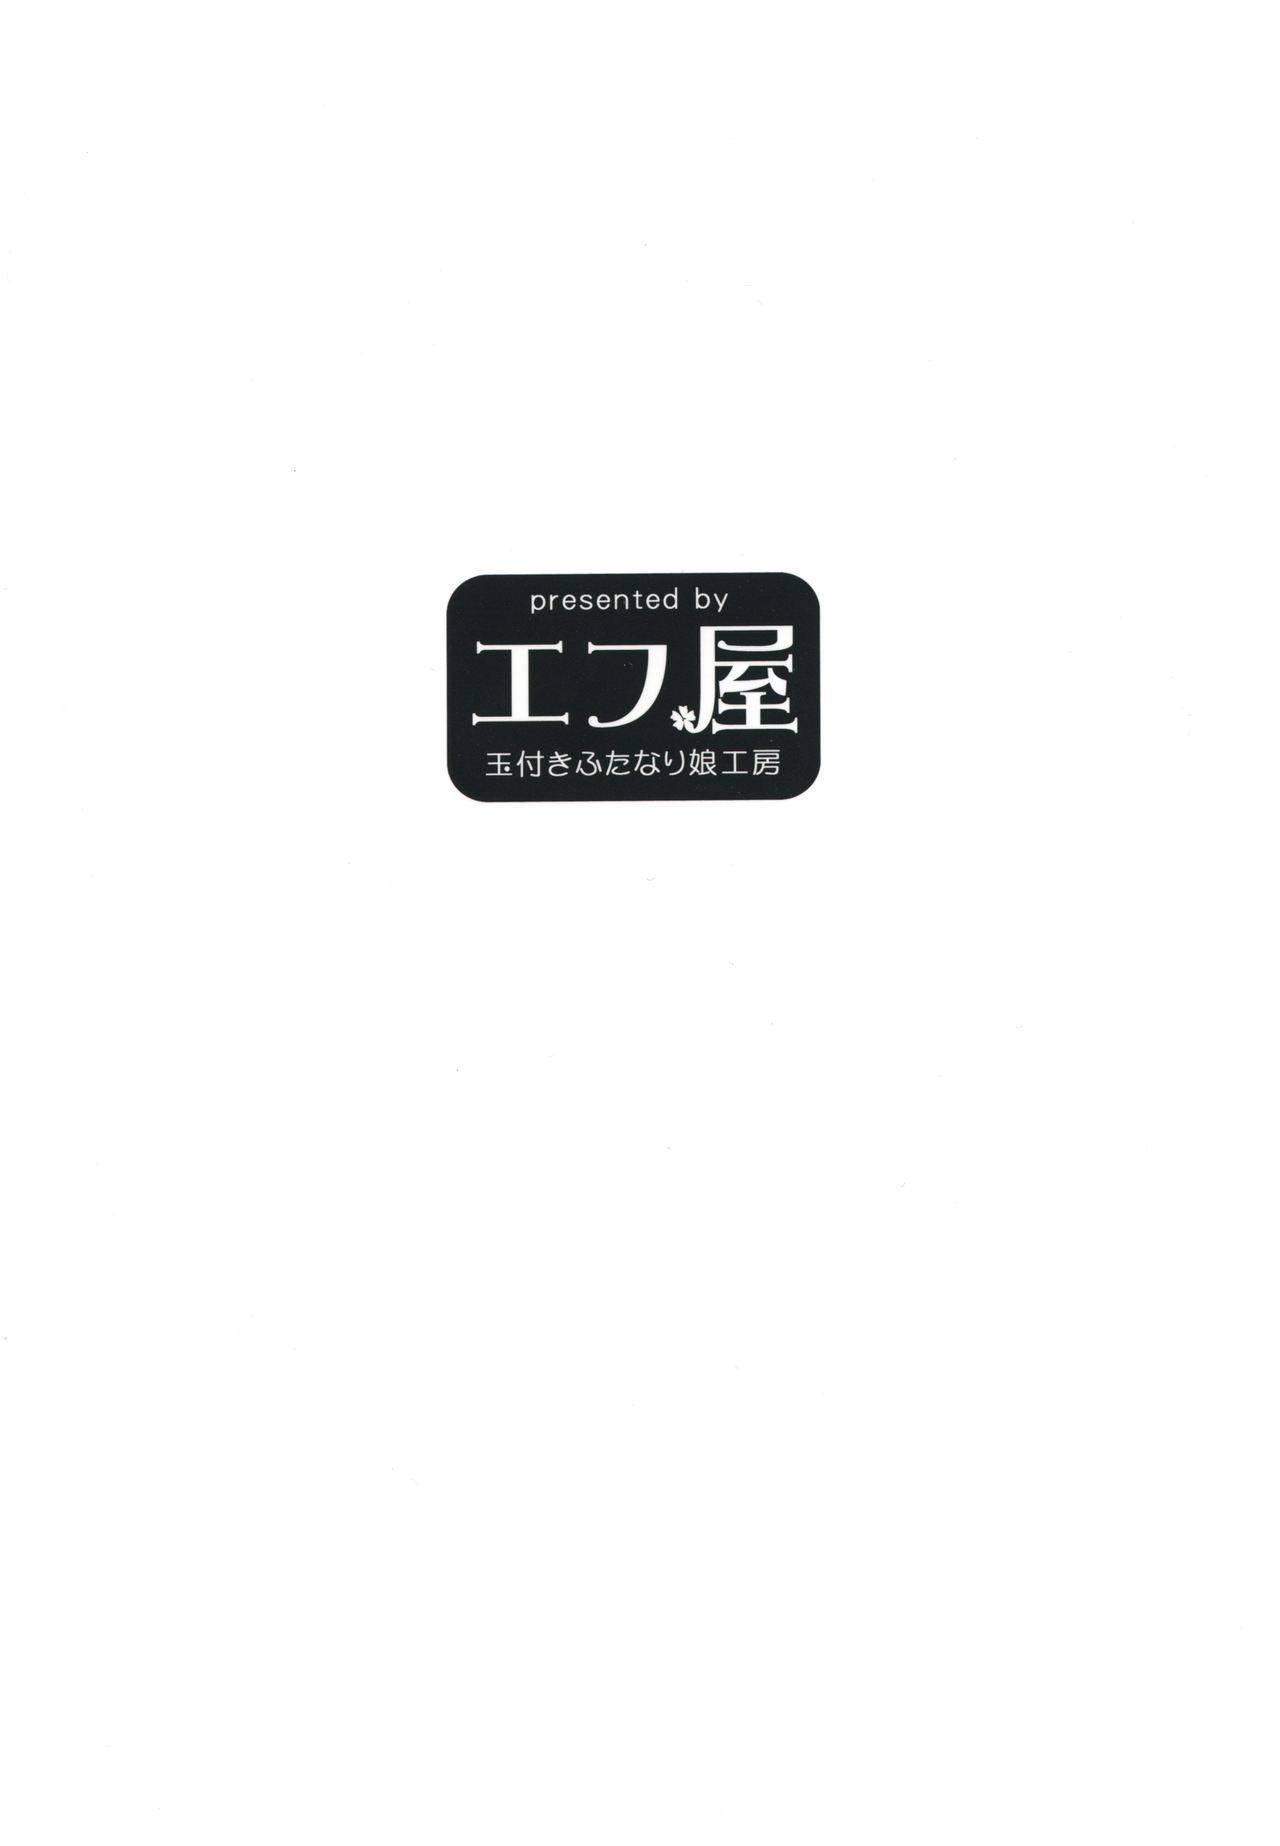 [Efuya (Messy)] Futanari Kanojo -Youshou Hen-   Futanari Girlfriend -Childhood Edition- [English] [q91] [Digital] 17